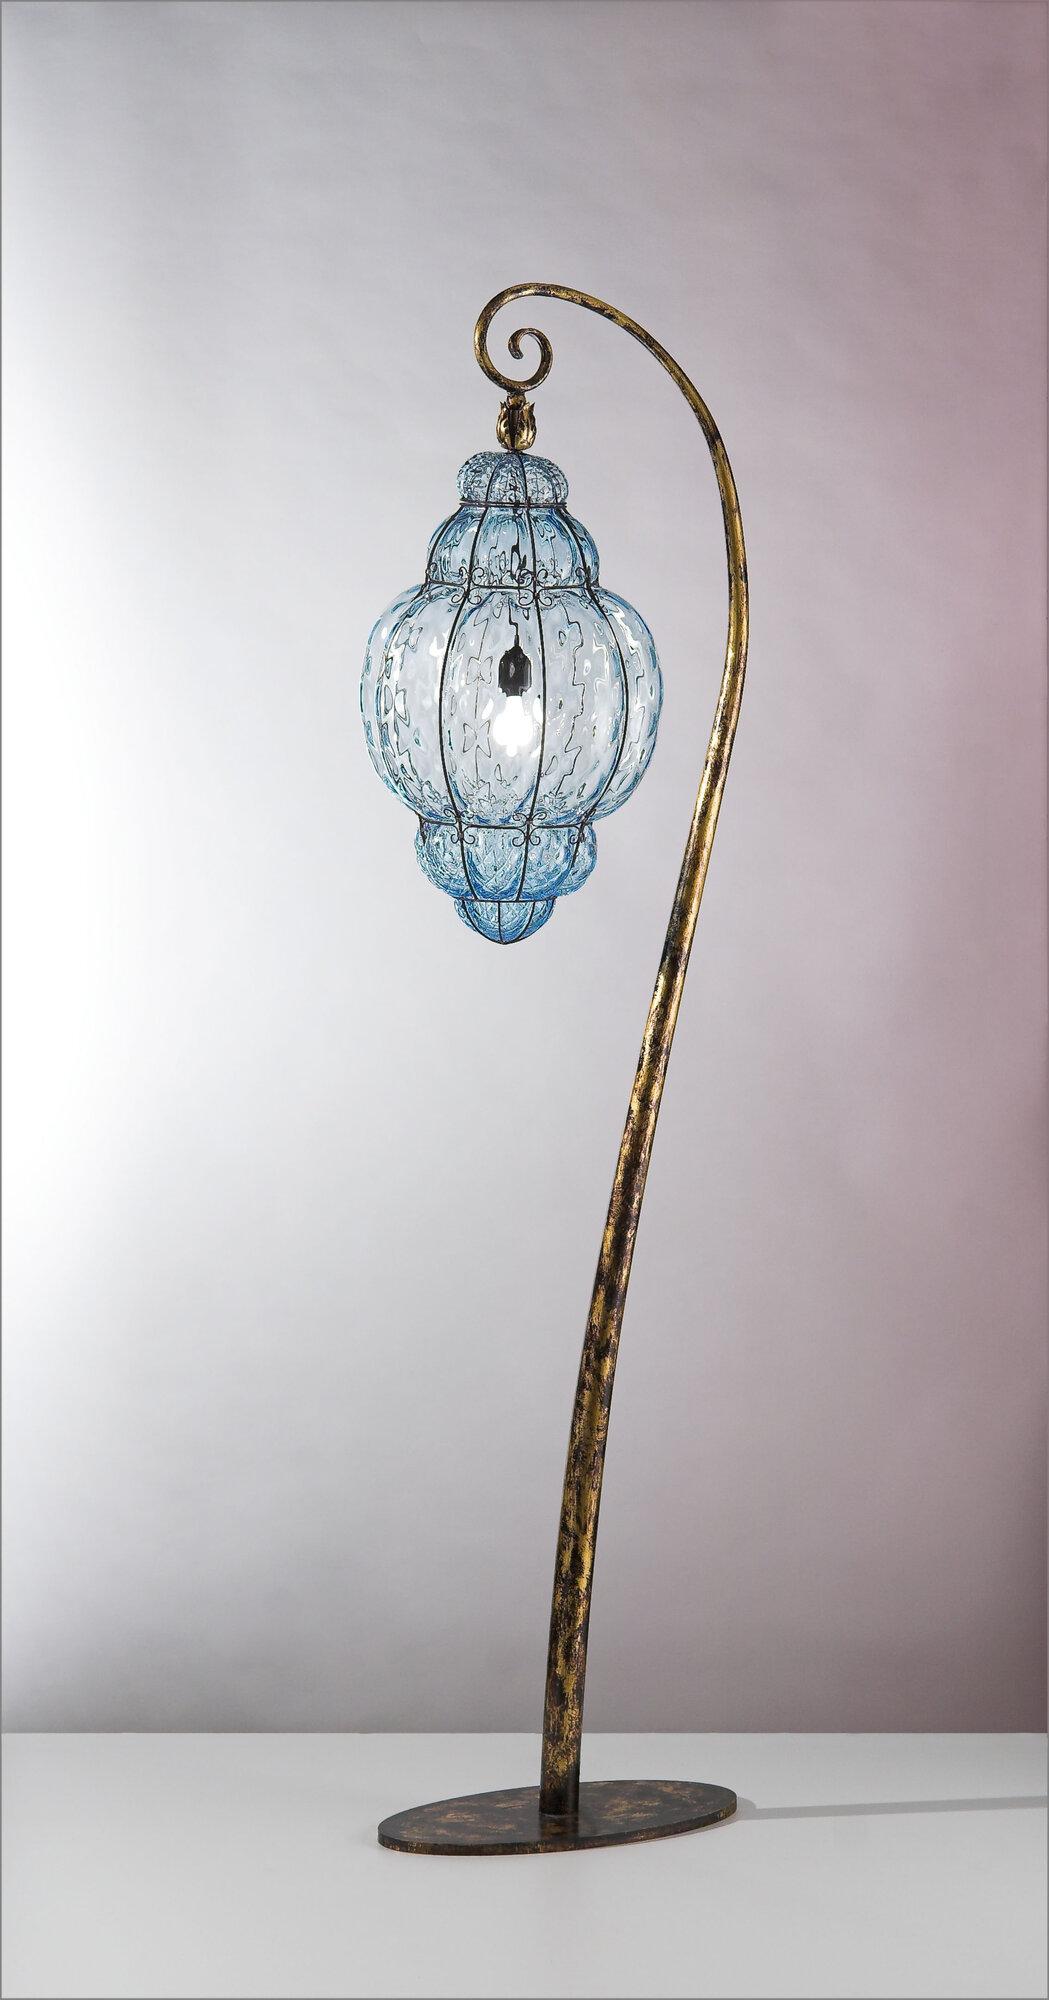 Siru-Vecchia-Murano-1-Light-Floor-Lamp